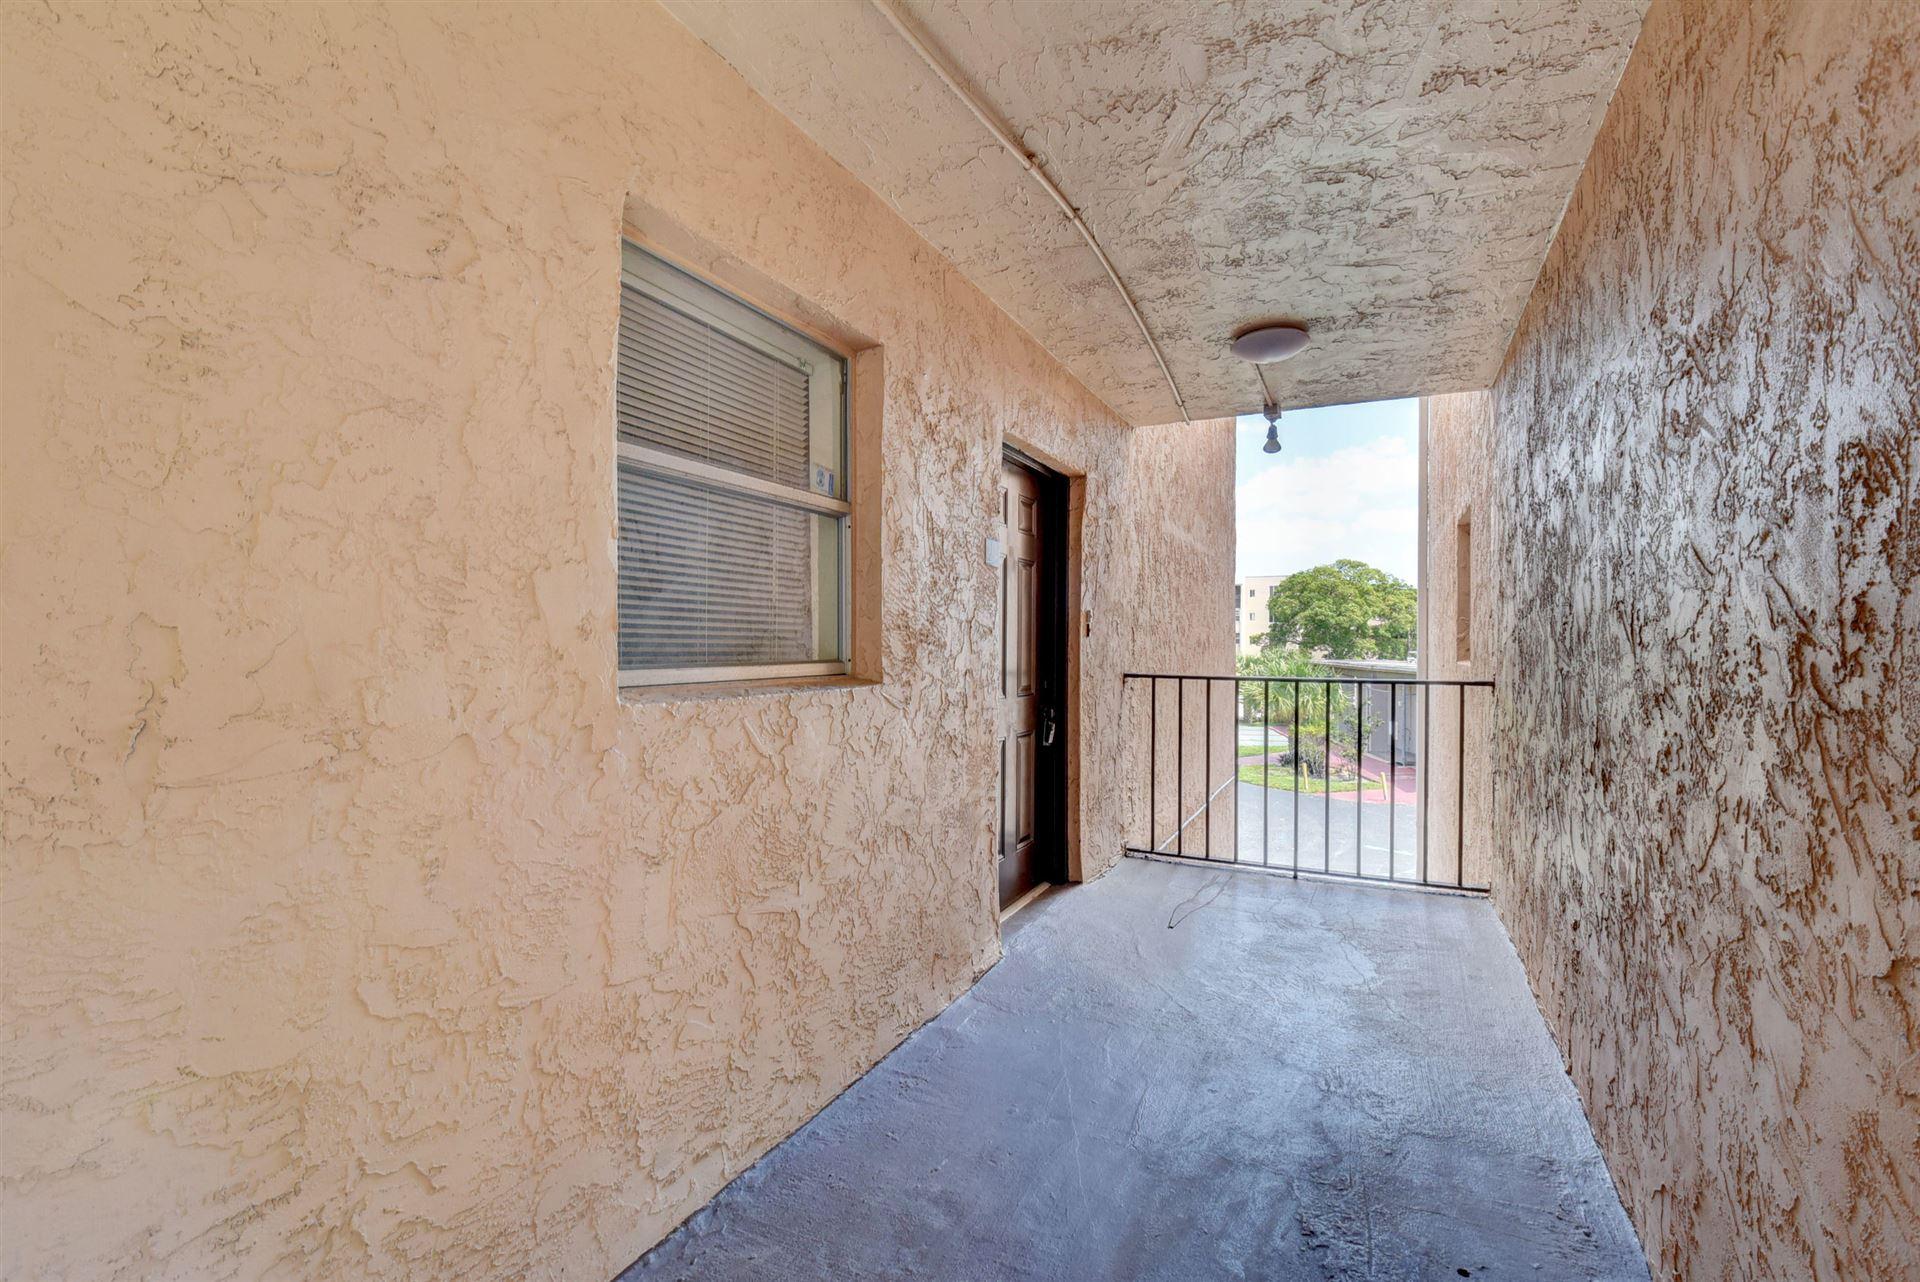 2800 Somerset Drive #214-J, Lauderdale Lakes, FL 33311 - #: RX-10623479